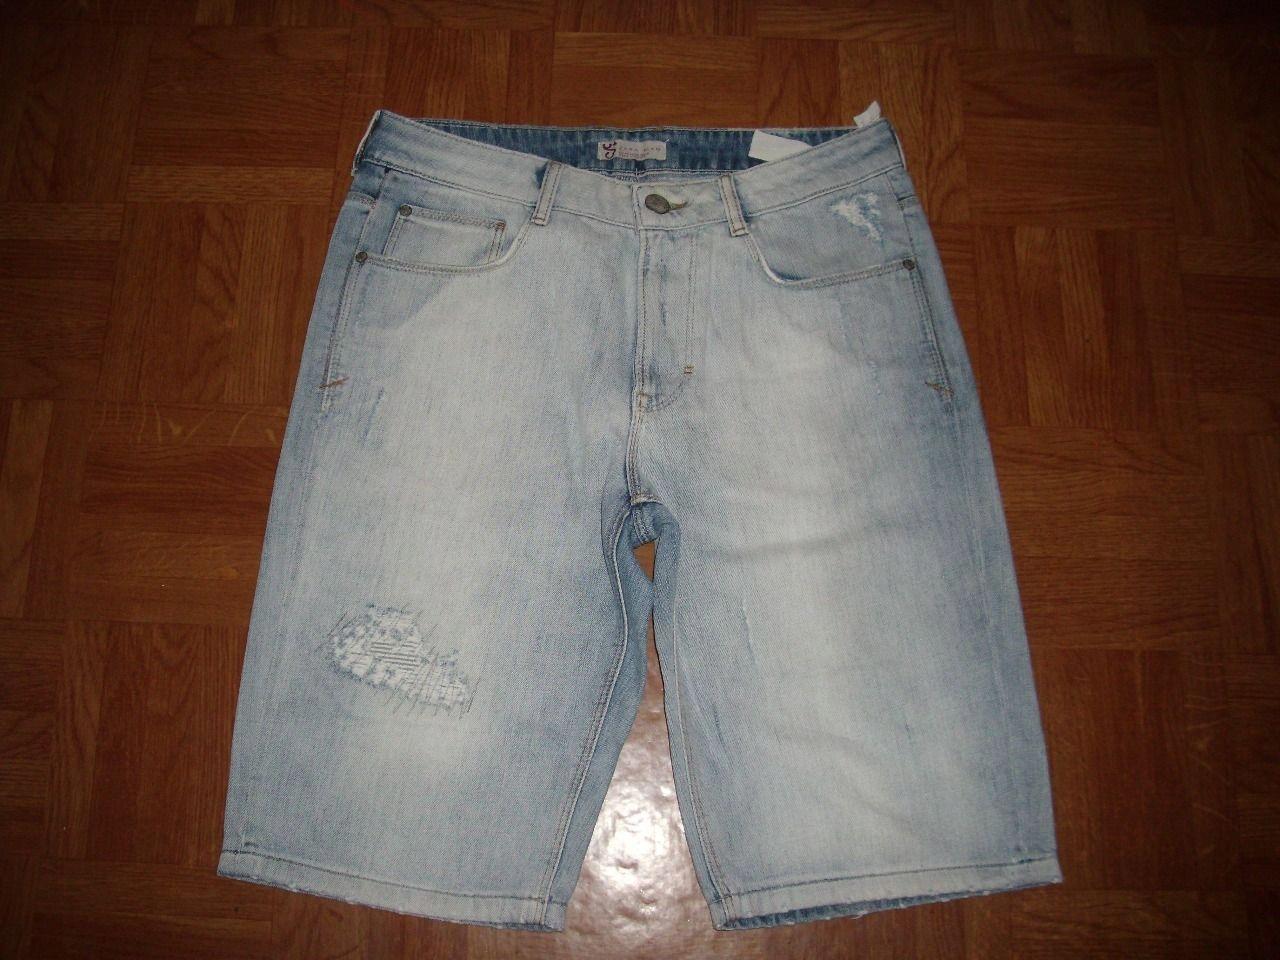 ZARA MAN spodenki jeans pas 86